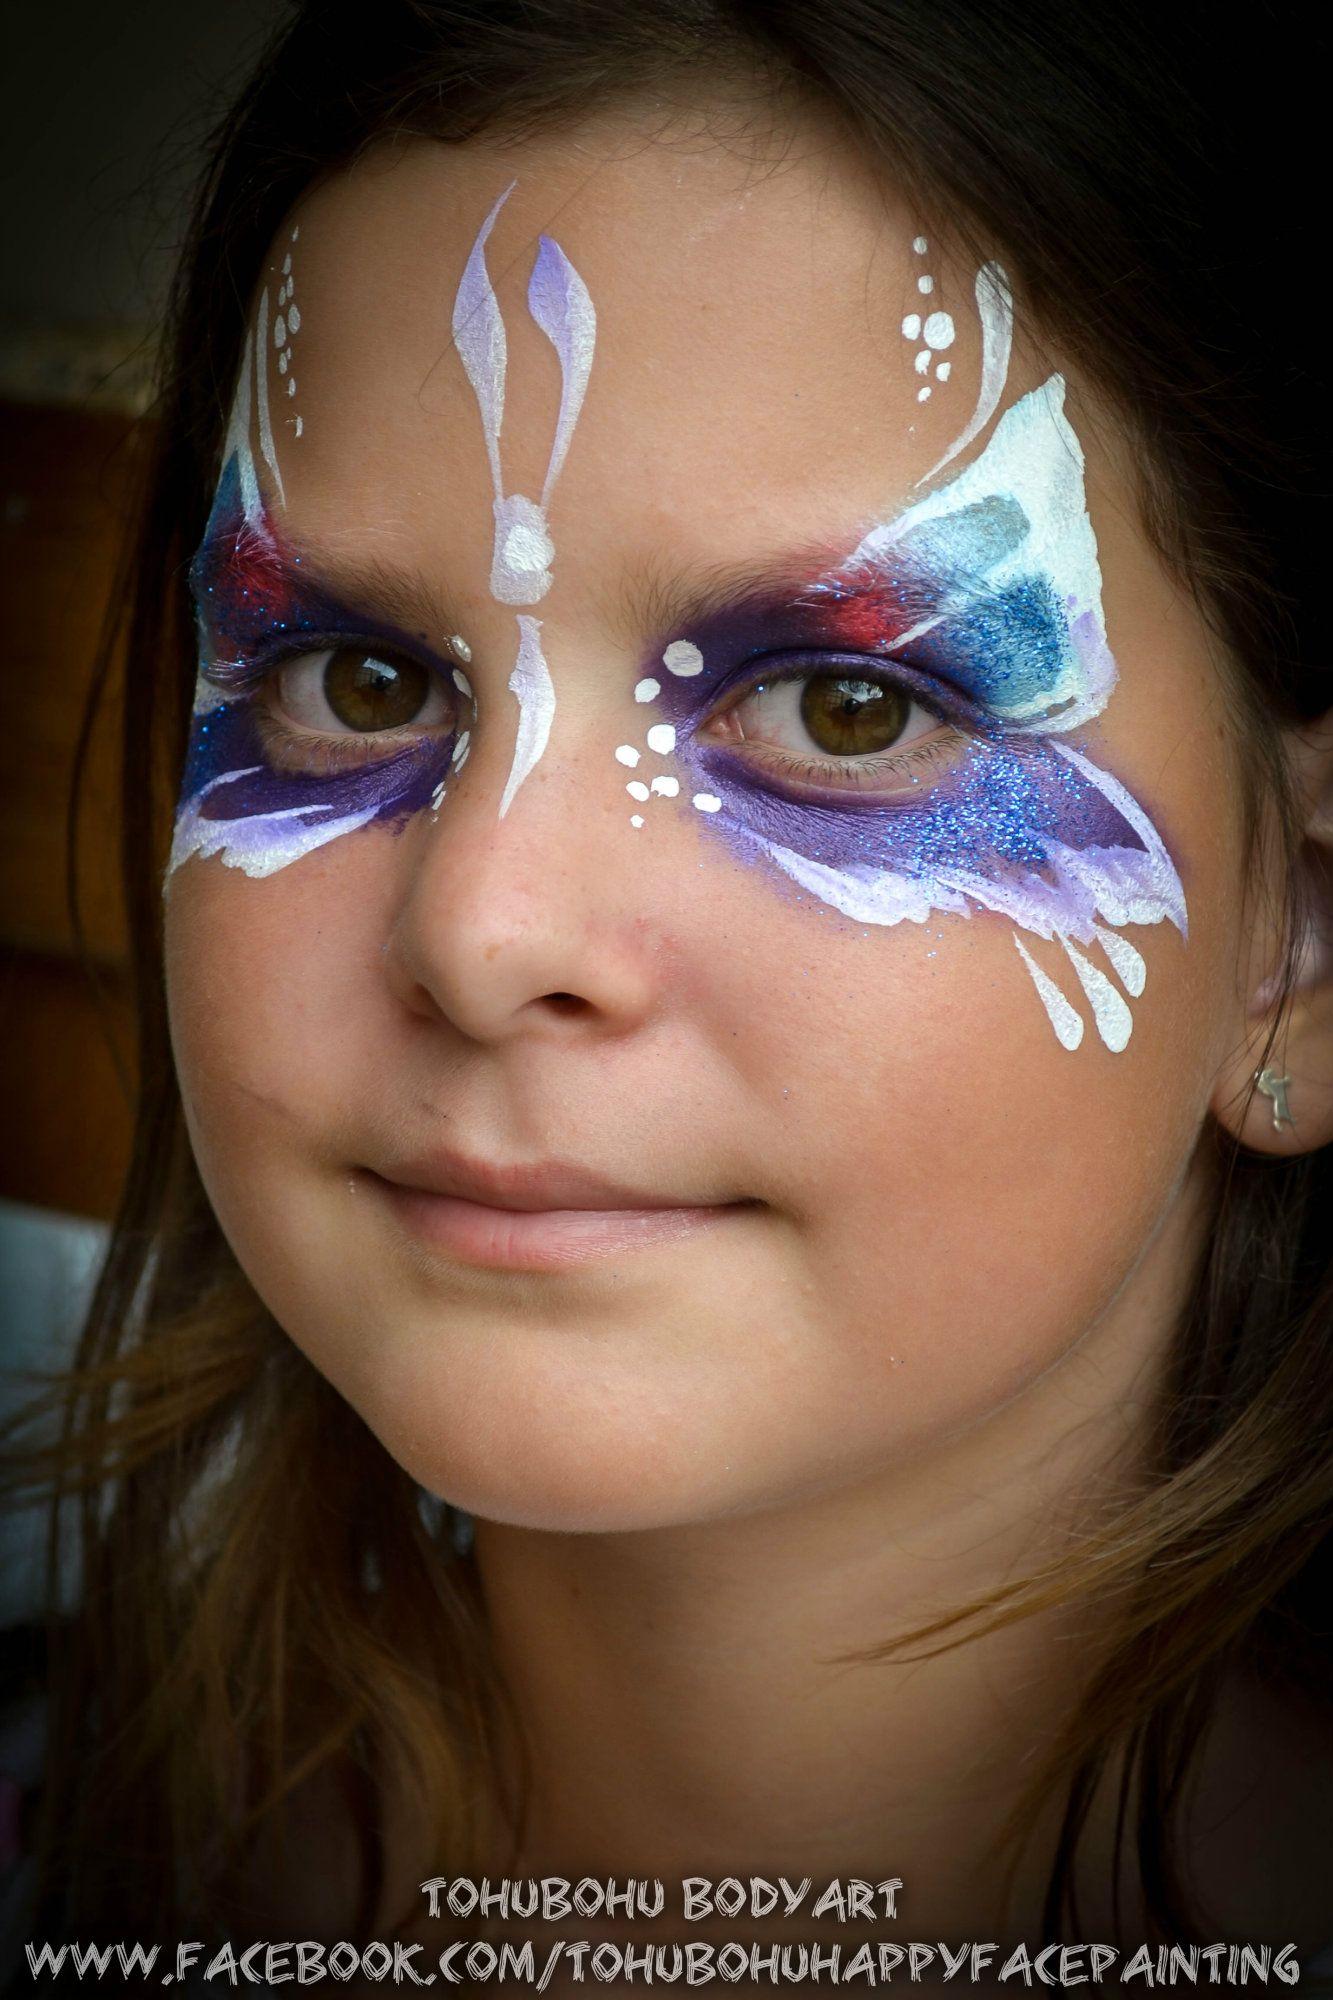 maquillages pour enfants papillon facepainting for child butterfly grimage bleu blanc. Black Bedroom Furniture Sets. Home Design Ideas